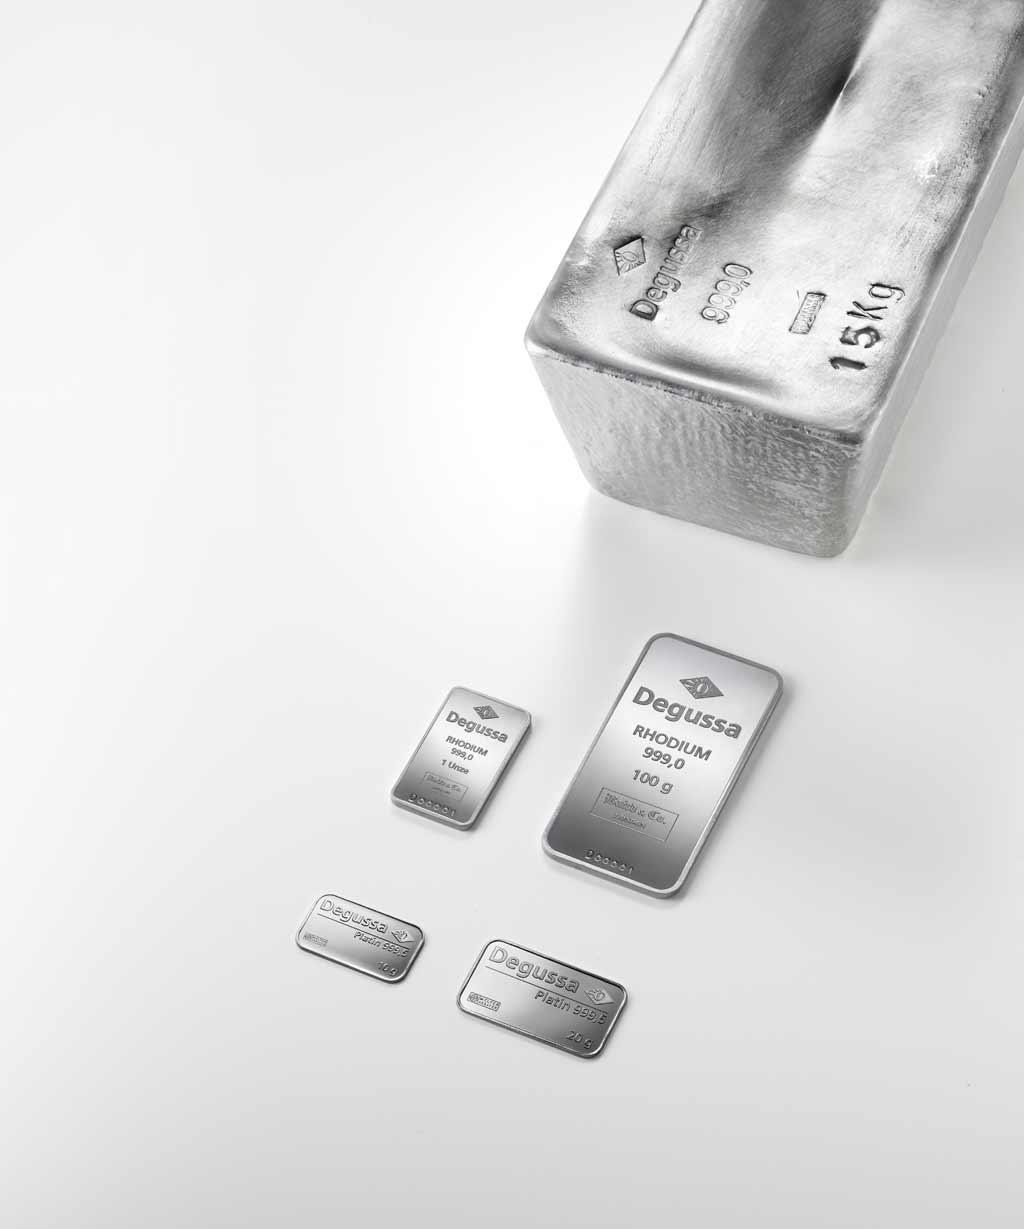 Degussa Goldhandel Platin Rhodium Silber 15kg Degussa Goldhandel